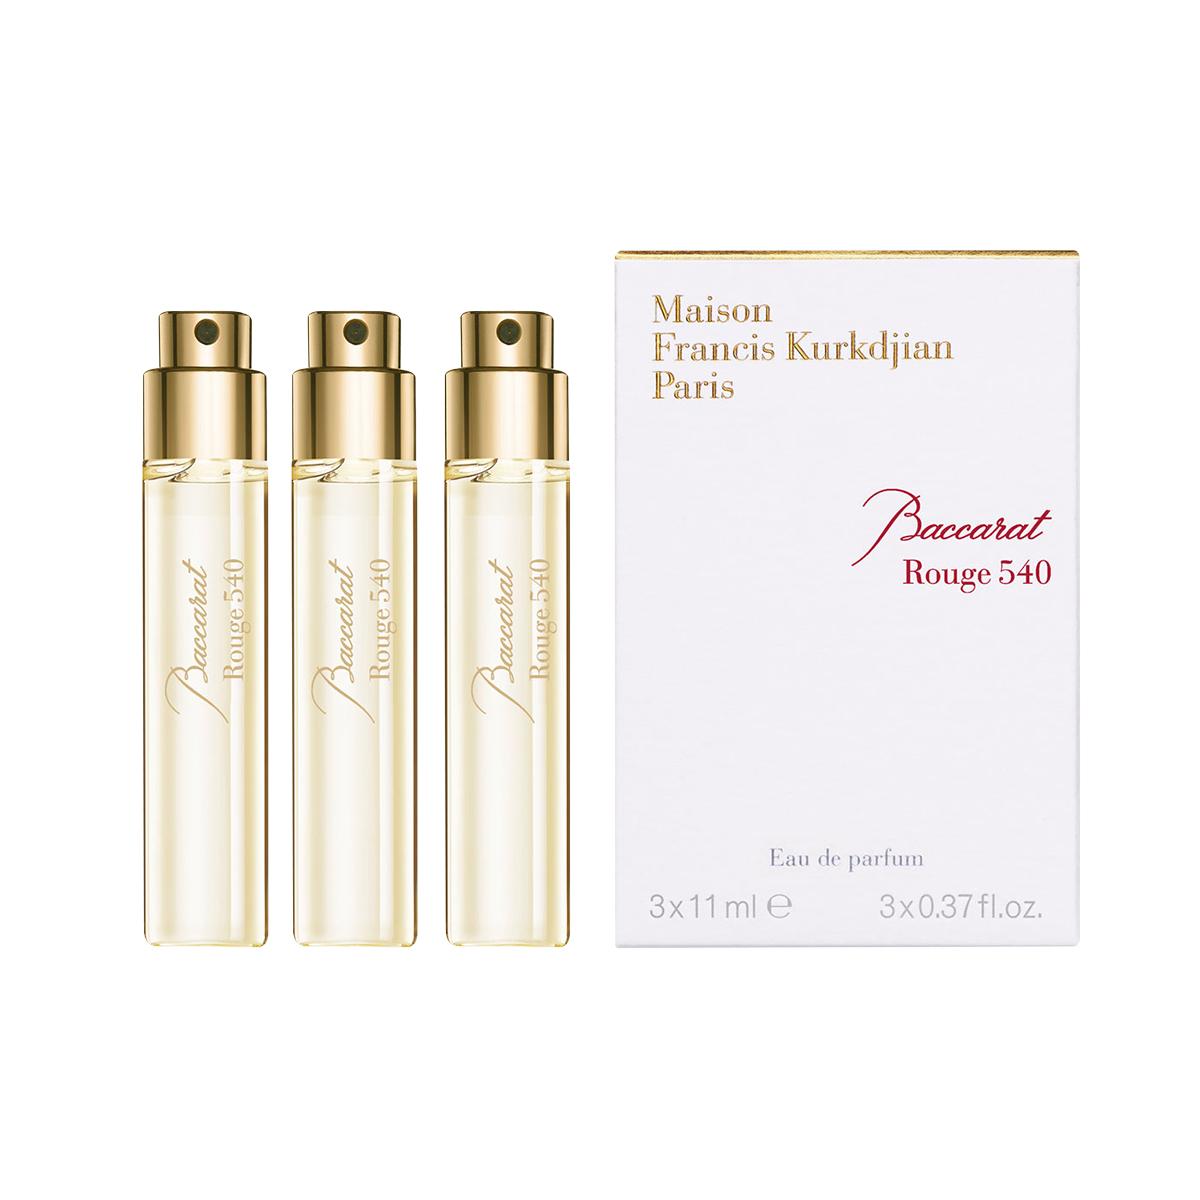 Maison Francis Kurkdjian Baccarat Rouge 20 Eau de Parfum Refill